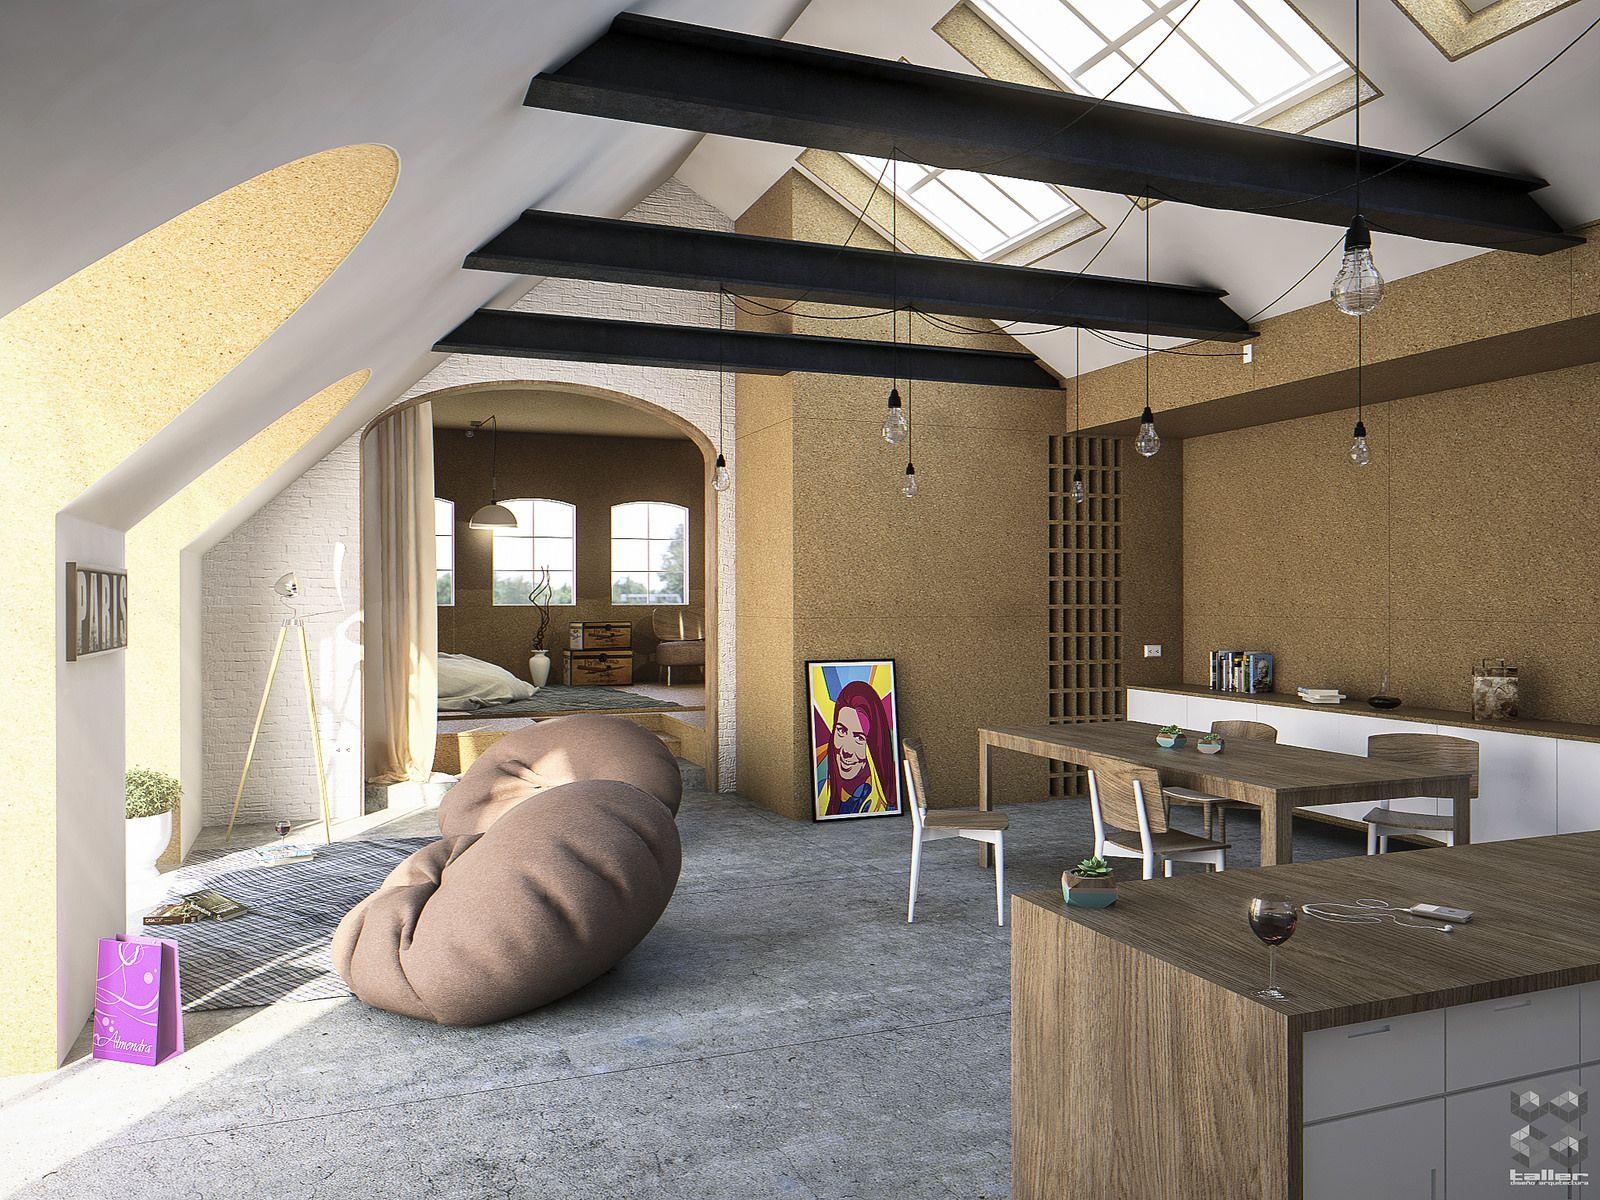 Visualizaci n arquitect nica dise o interior casa taller for Oficinas de diseno y arquitectura